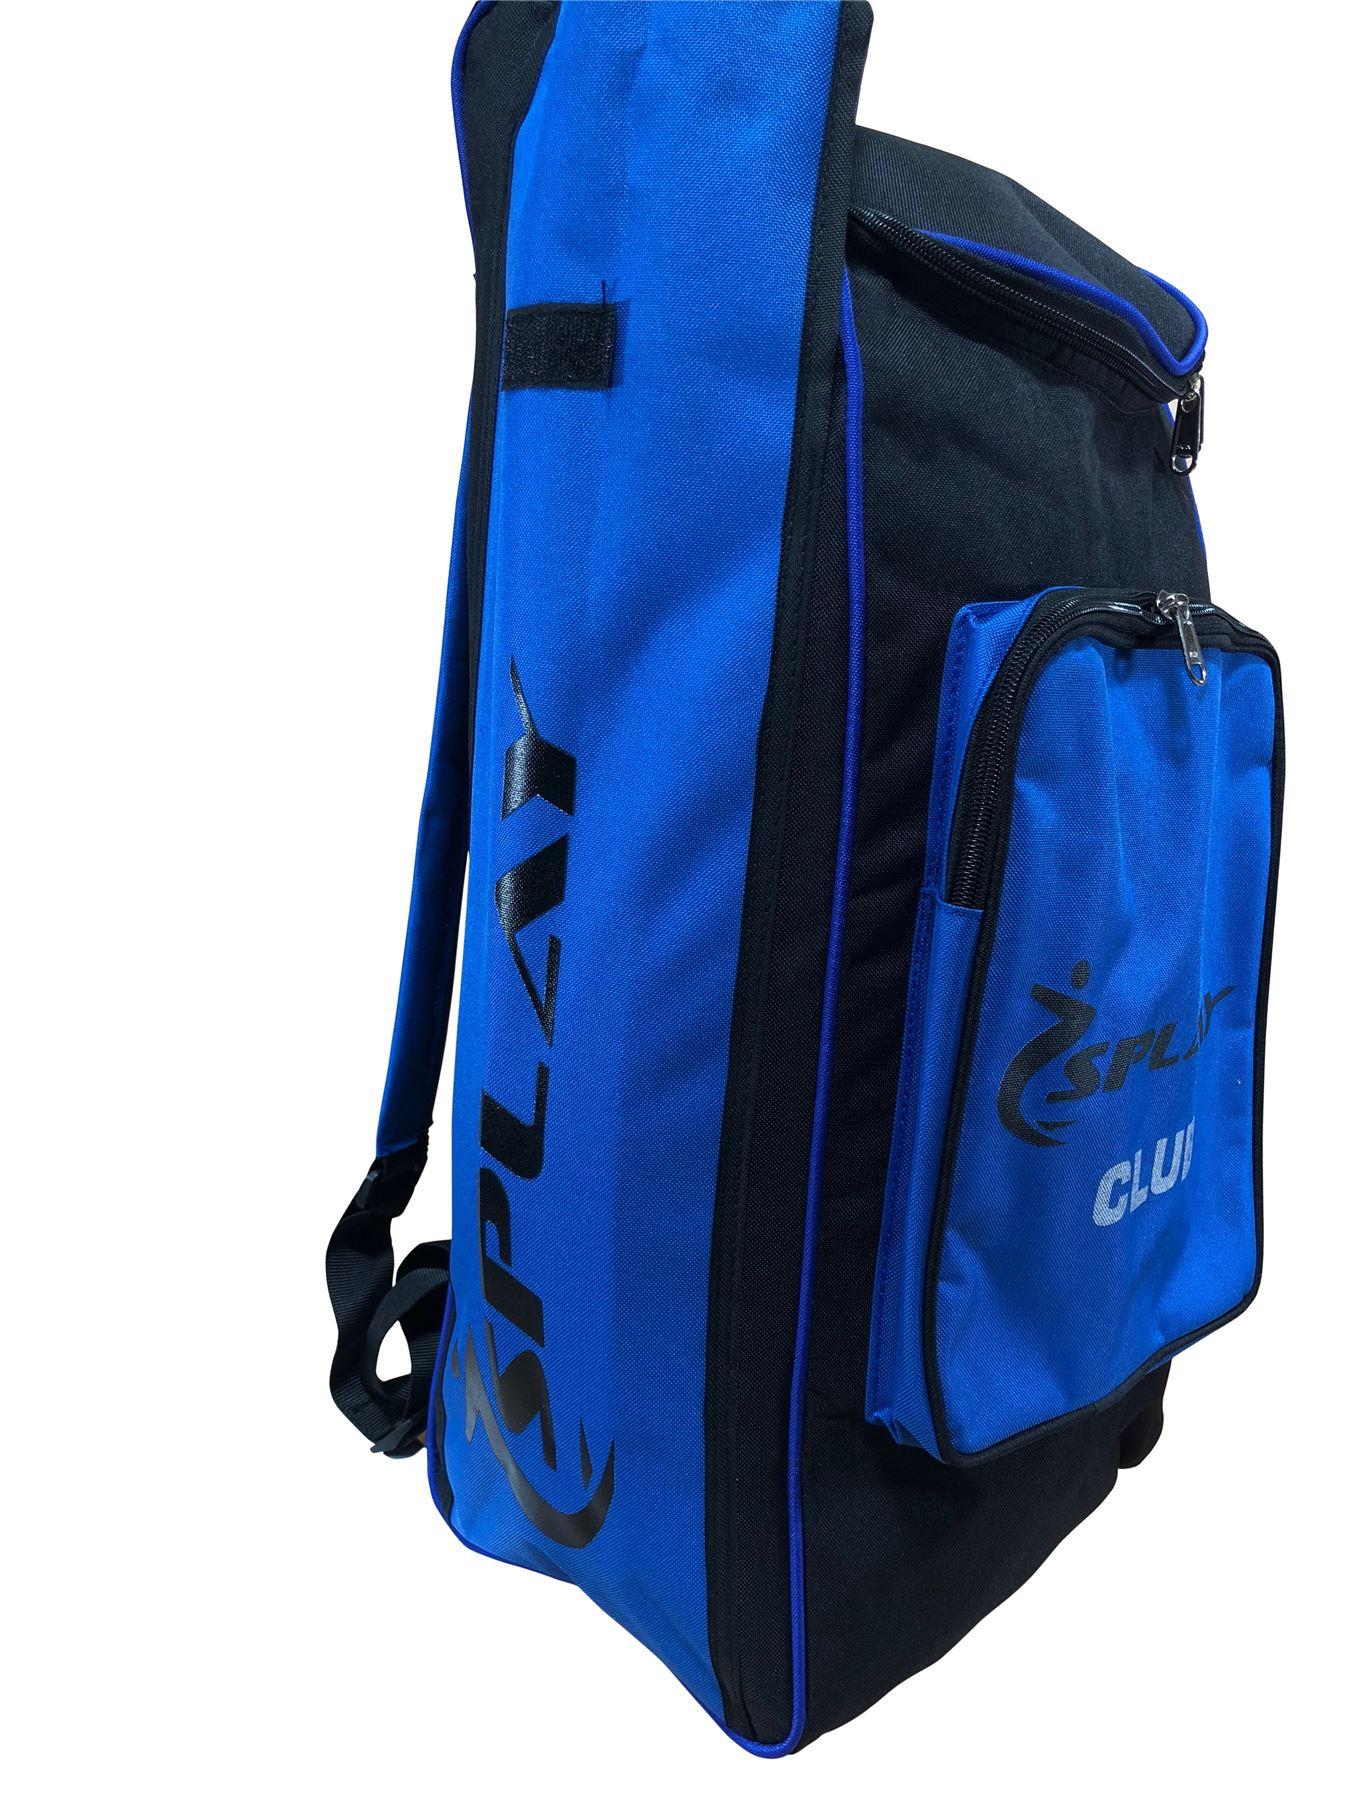 0d70dd4e3c Splay Club Cricket Kit Bag